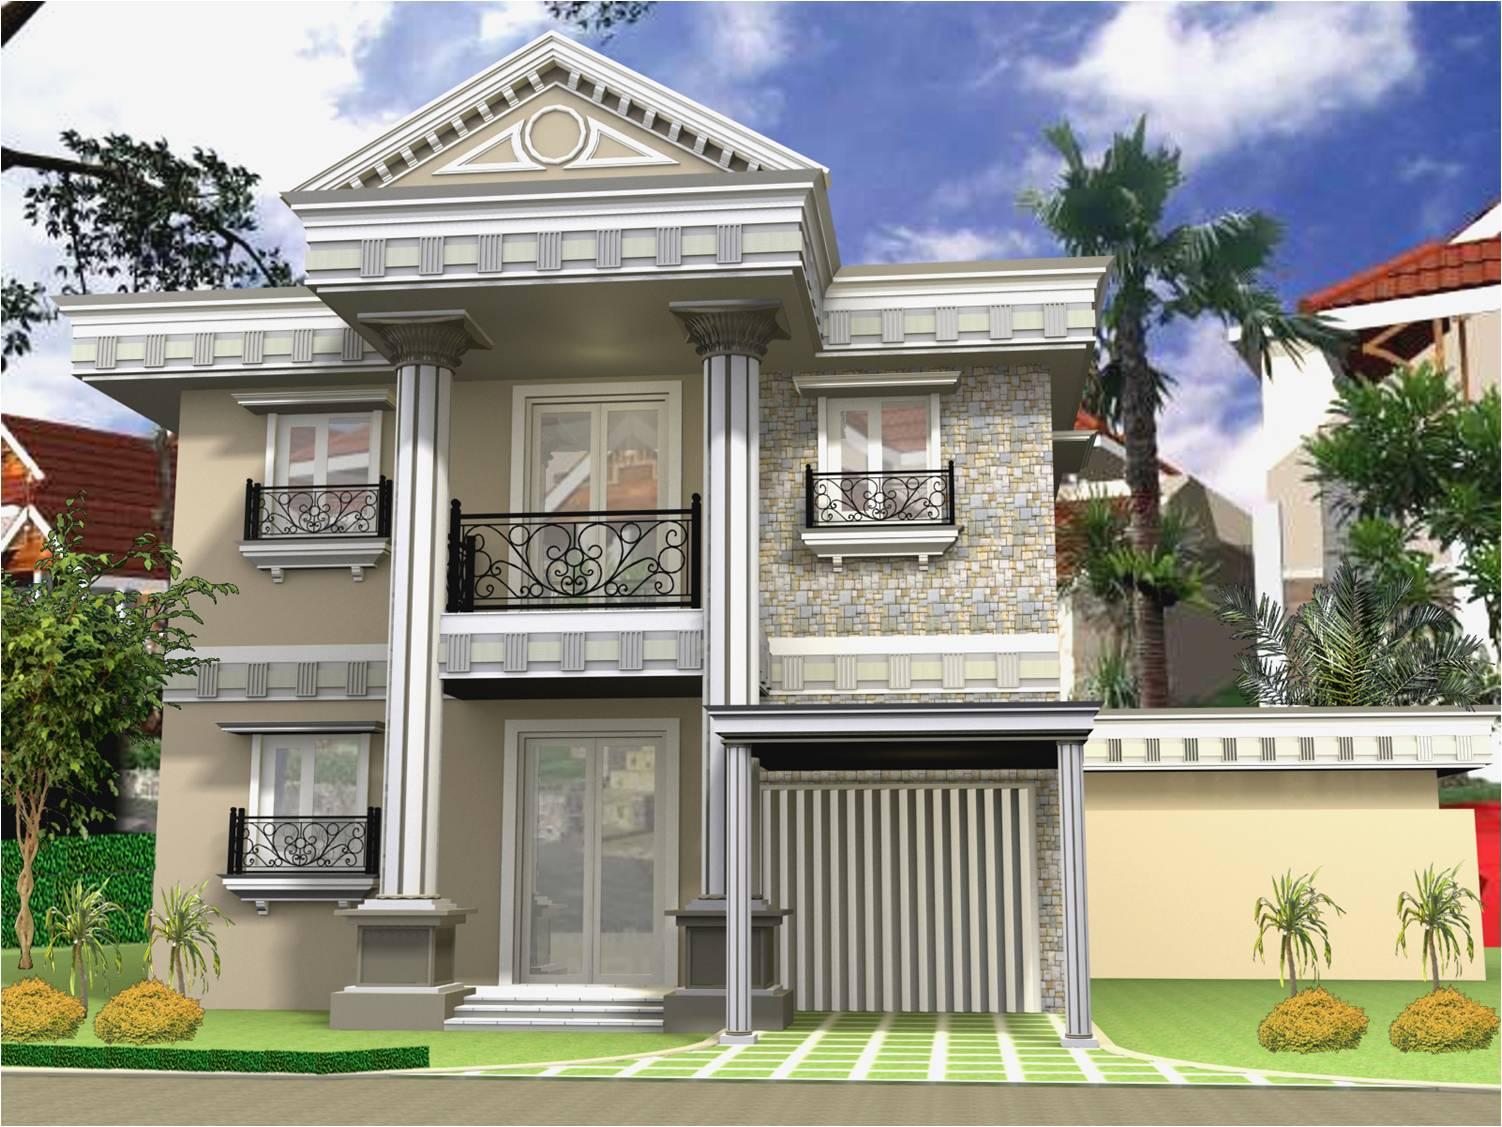 Rumah Minimalis Modern Klasik, Hunian Damai dan Tenang 2017 - Cafe Elwazeen